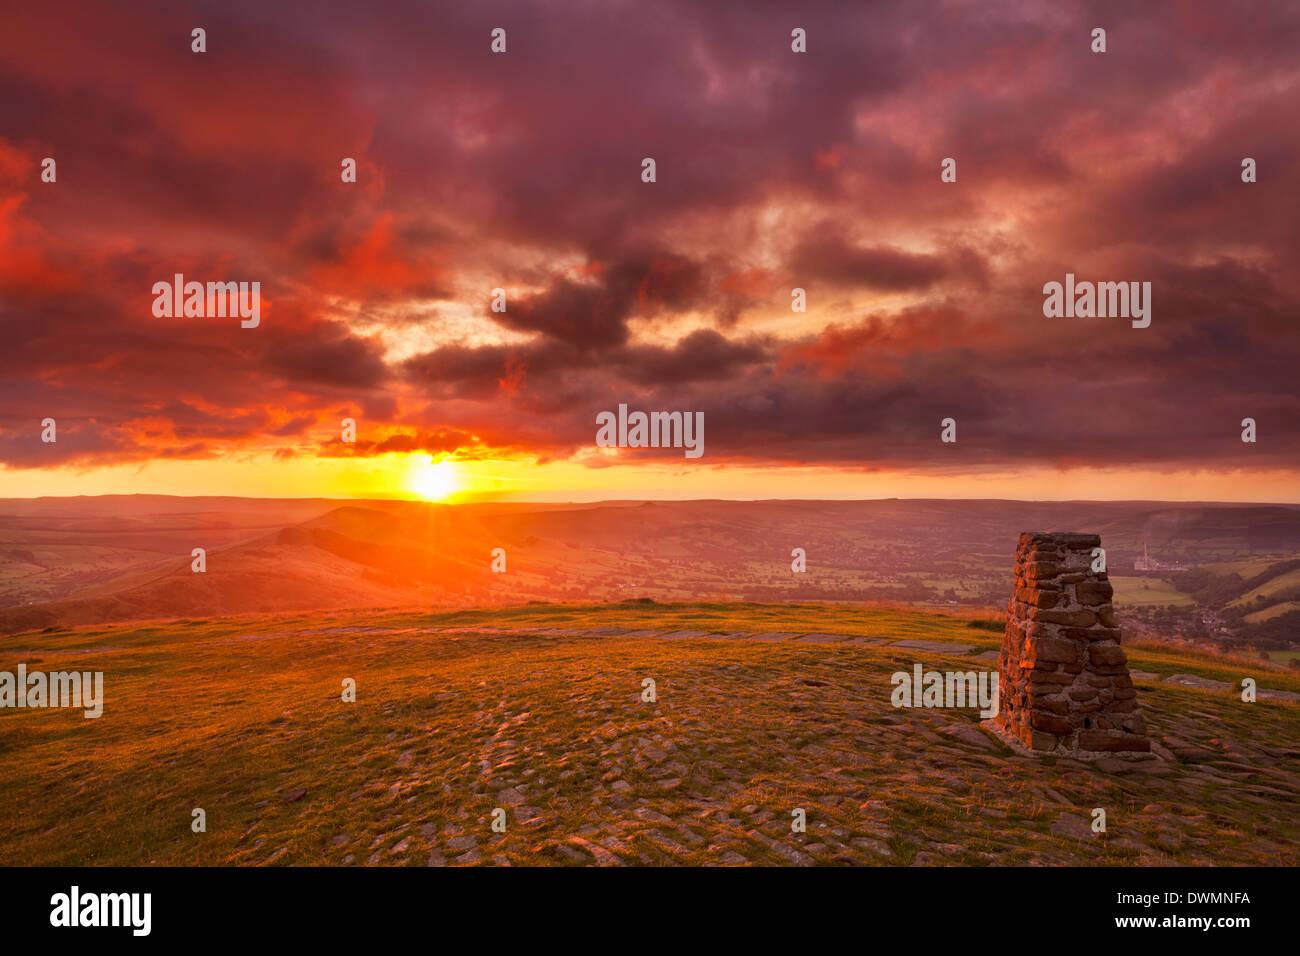 Sunrise on Great Ridge, Mam Tor, Hope Valley, Peak District National Park, Derbyshire, England, United Kingdom, Europe - Stock Image